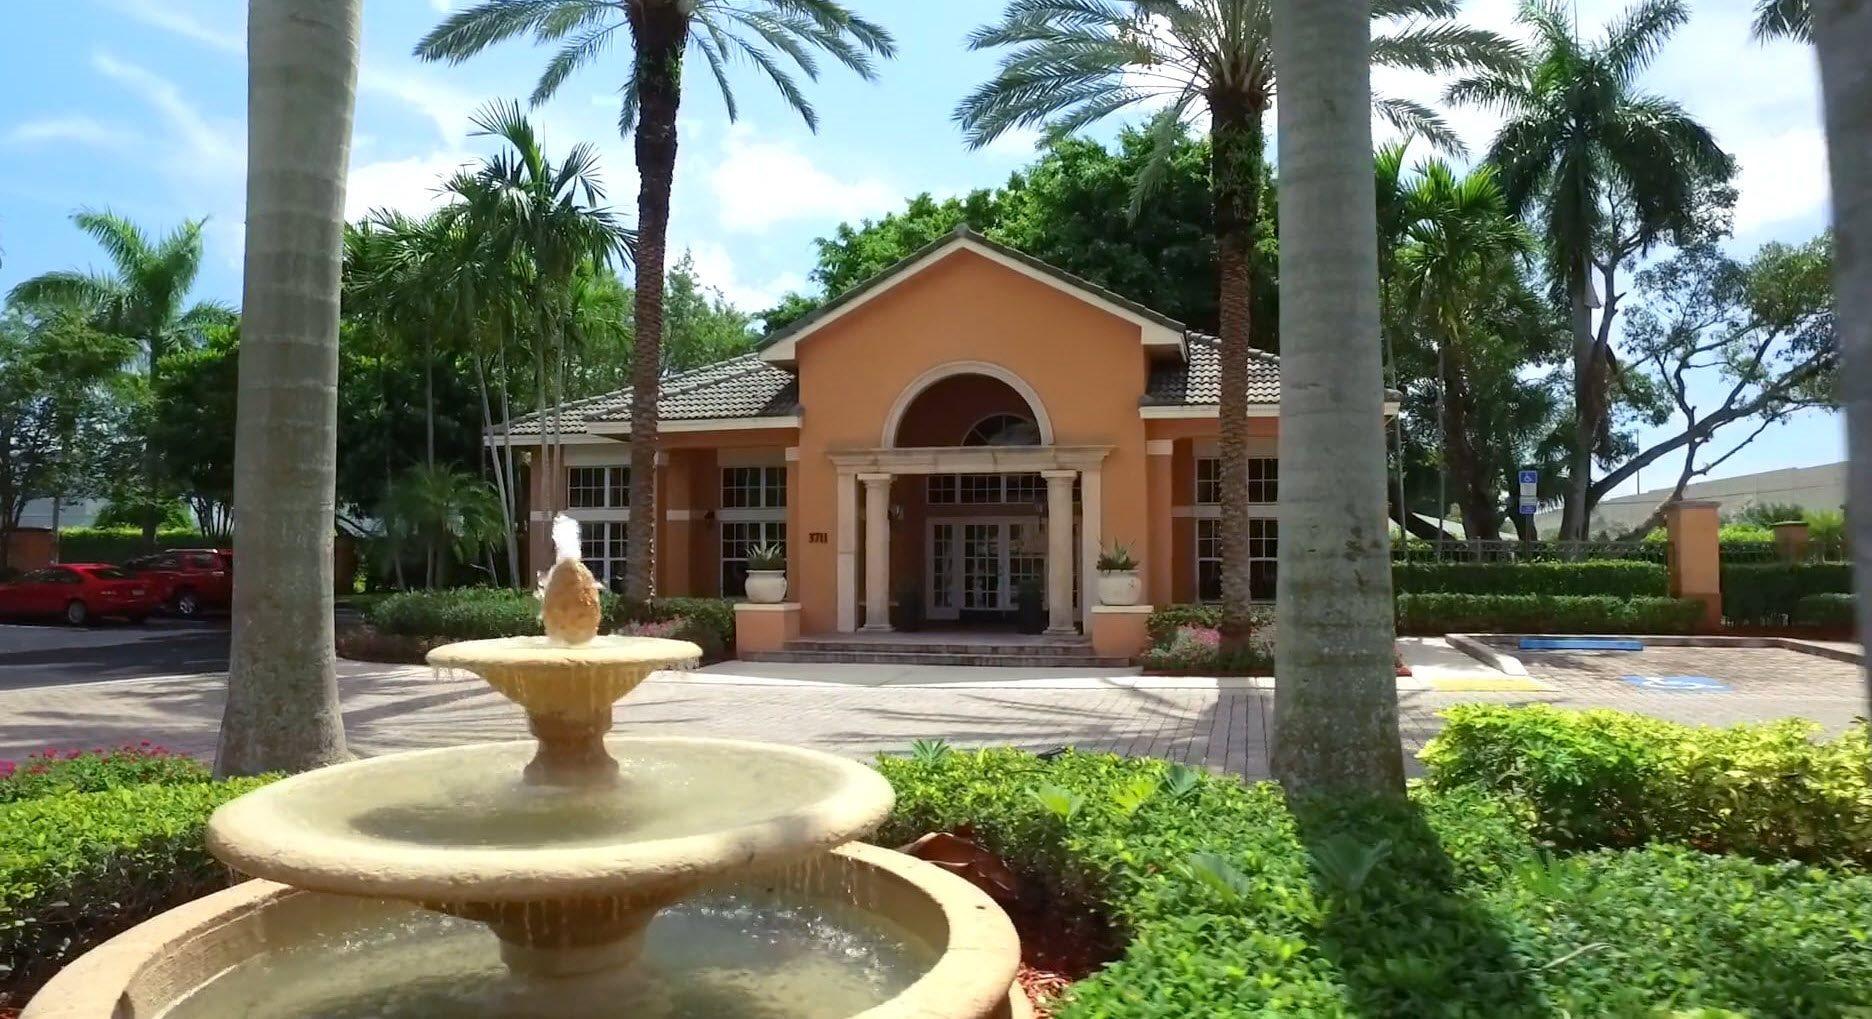 New River Cove Apartments in Davie, FL